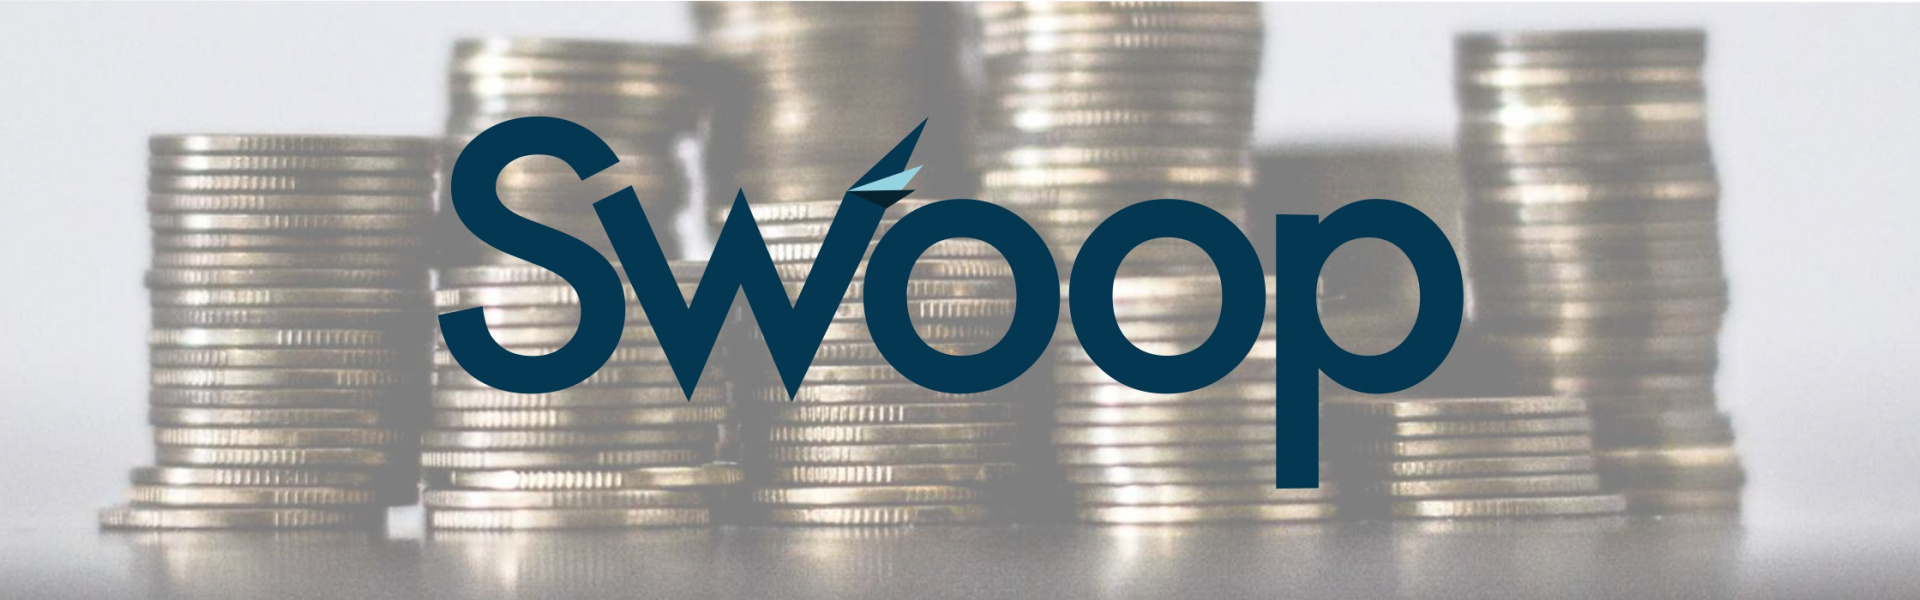 Swoop-loans-grants-equity-funding-businesses-Drone Major